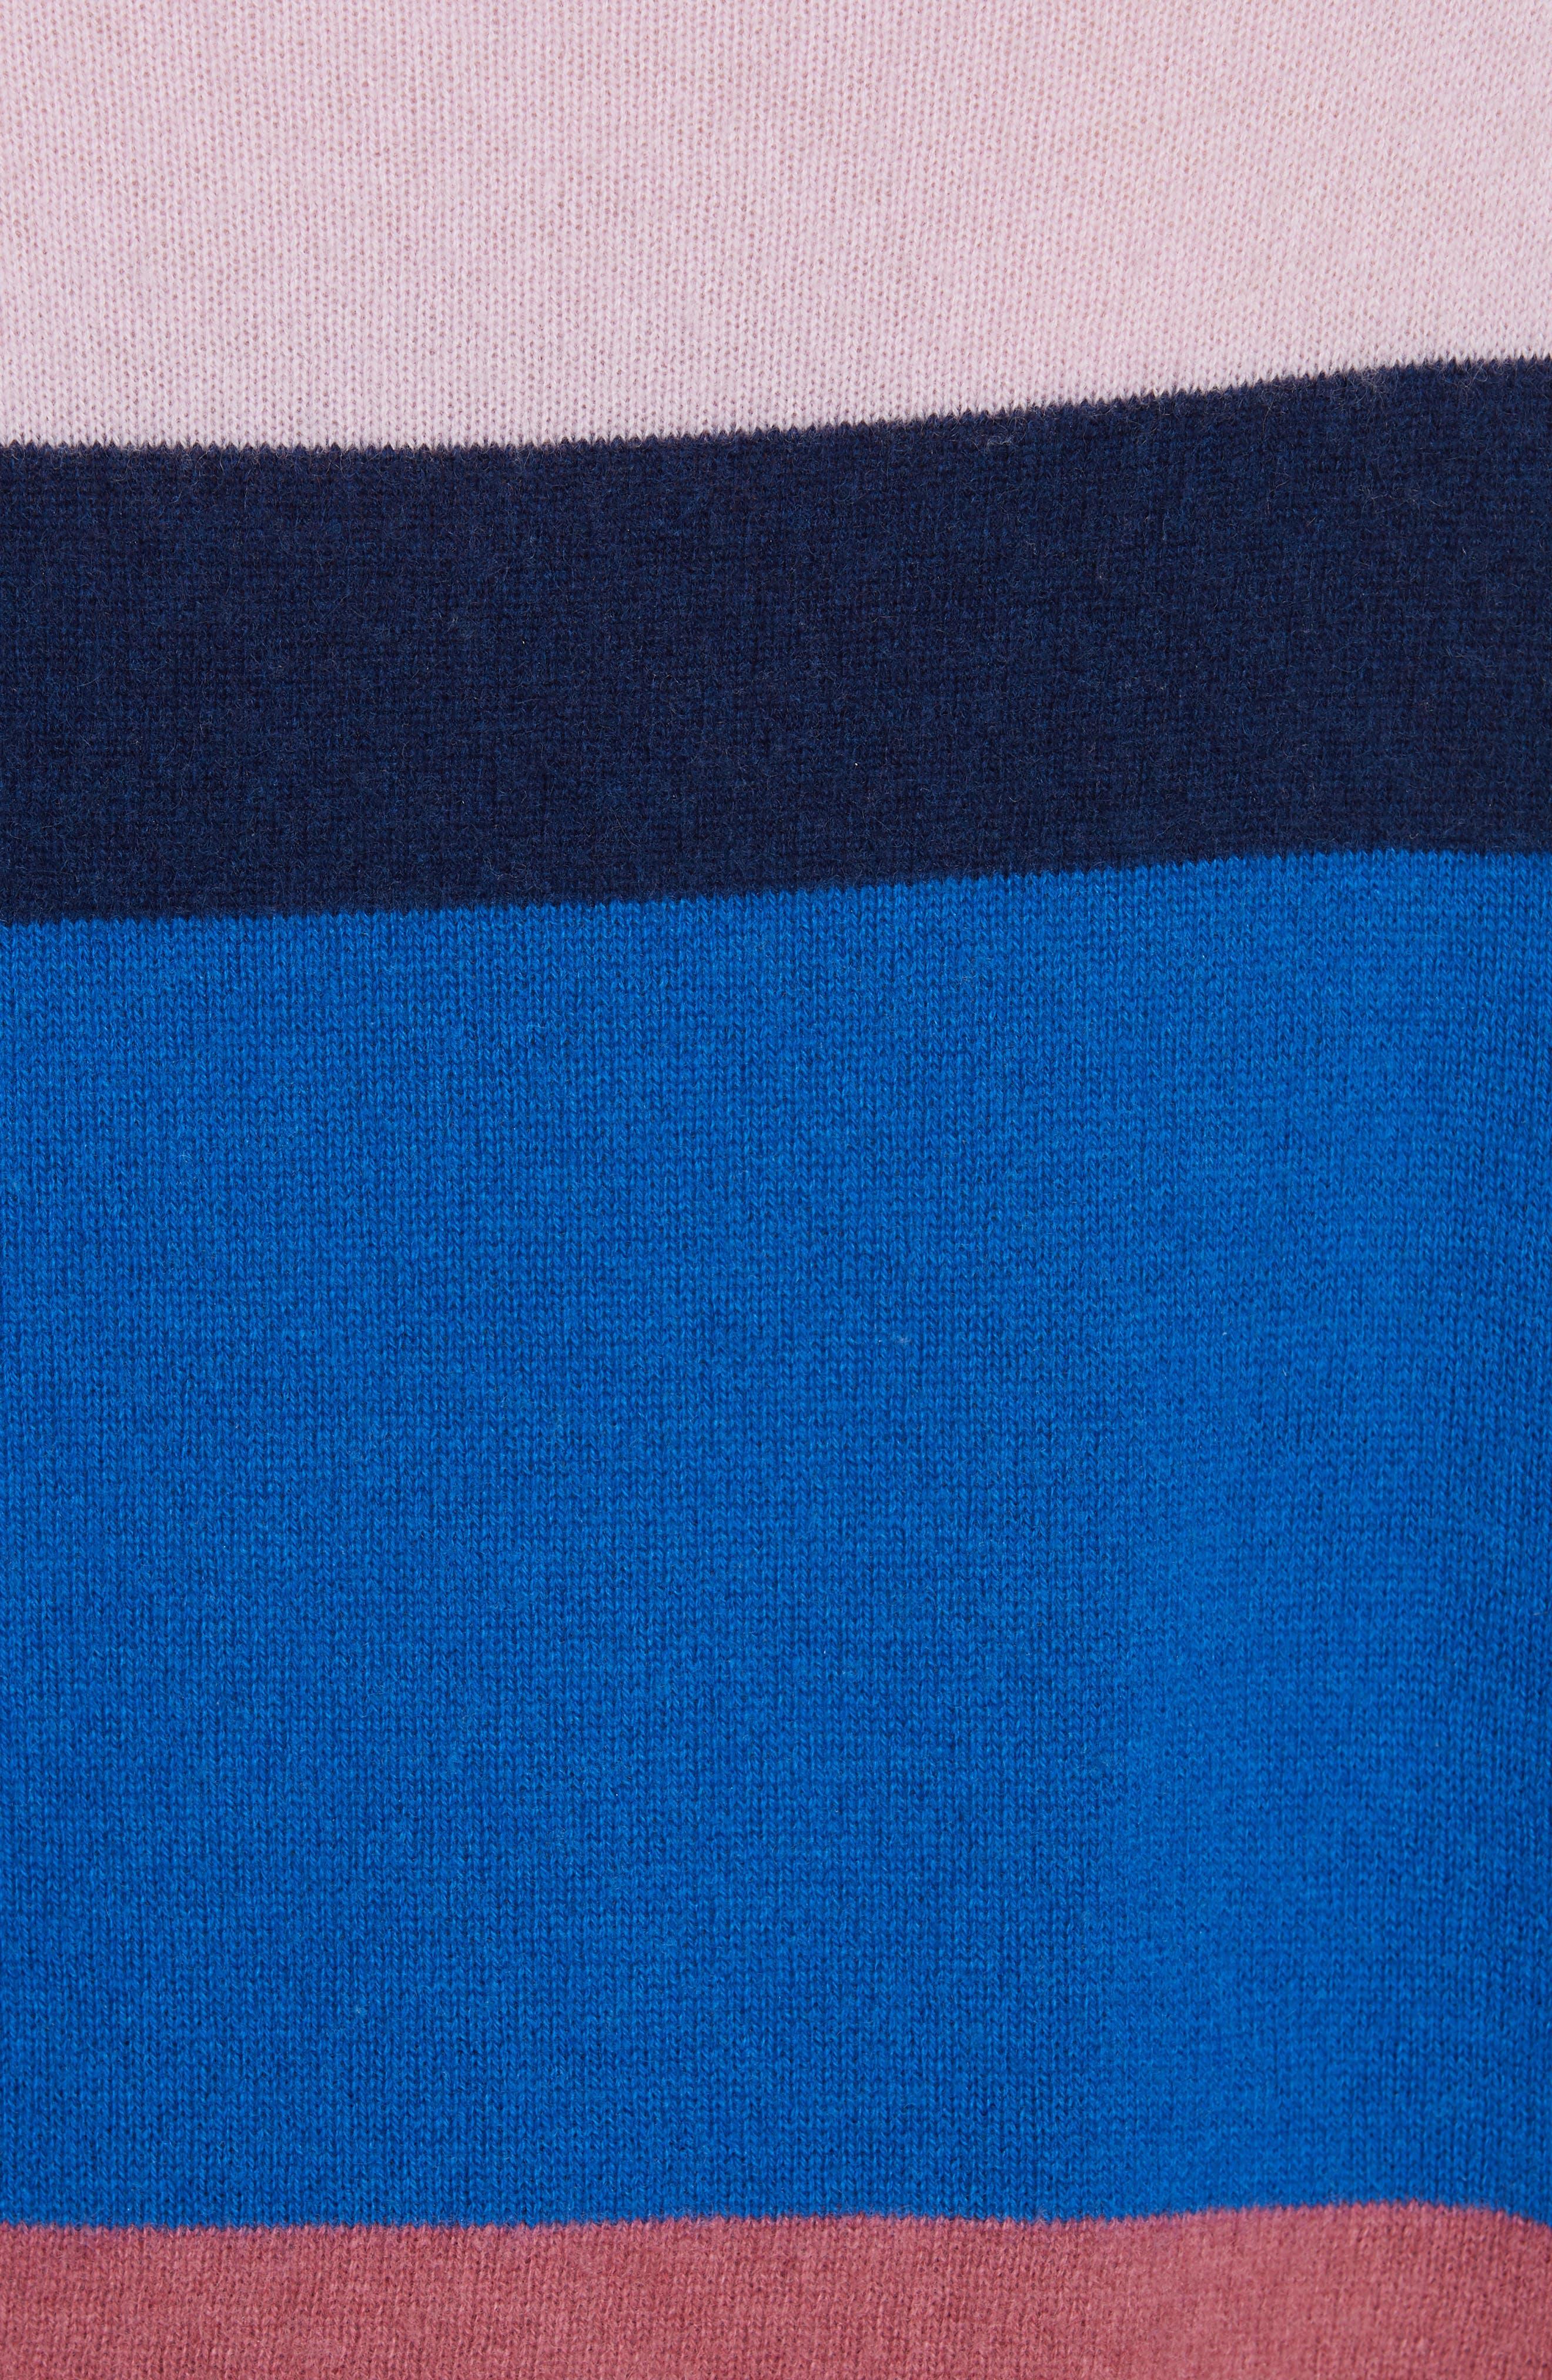 Stripe Mock Neck Cashmere Pullover,                             Alternate thumbnail 5, color,                             ROYAL BLUE MULTI